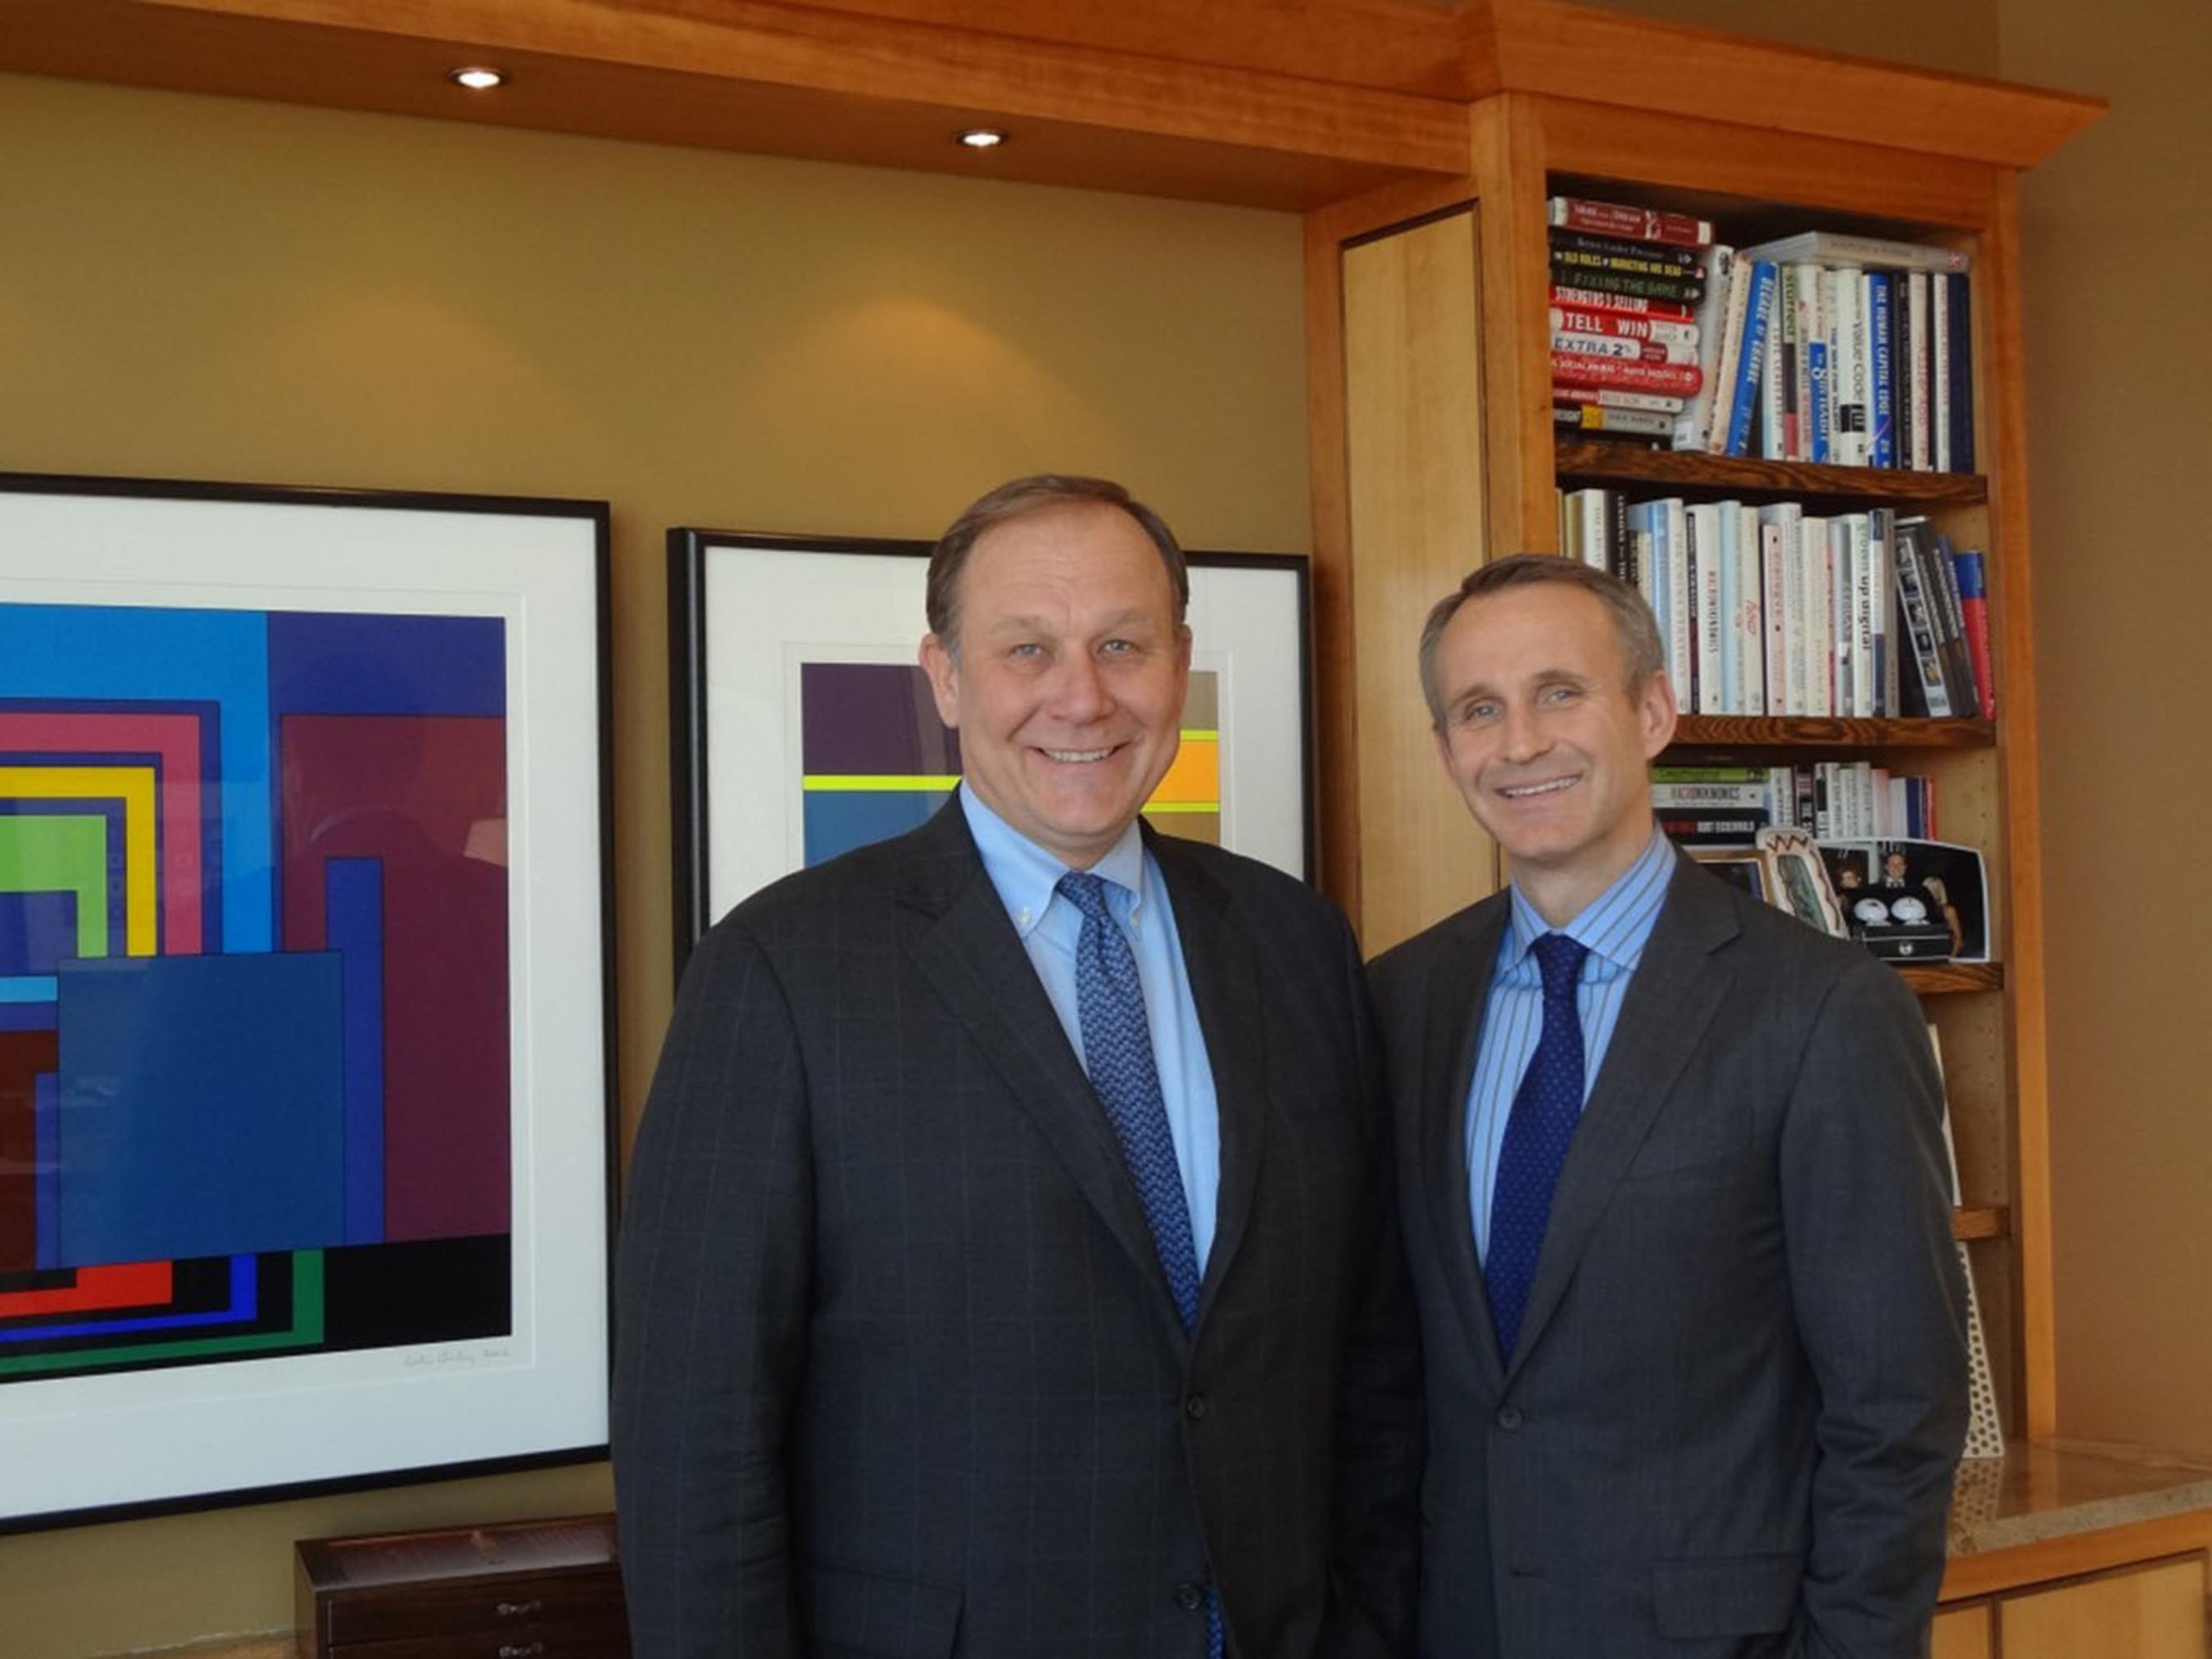 Jonas Prising (right) elected ManpowerGroup CEO; Jeffrey Joerres (left) named Executive Chairman, both effective May 1, 2014.  (PRNewsFoto/ManpowerGroup)